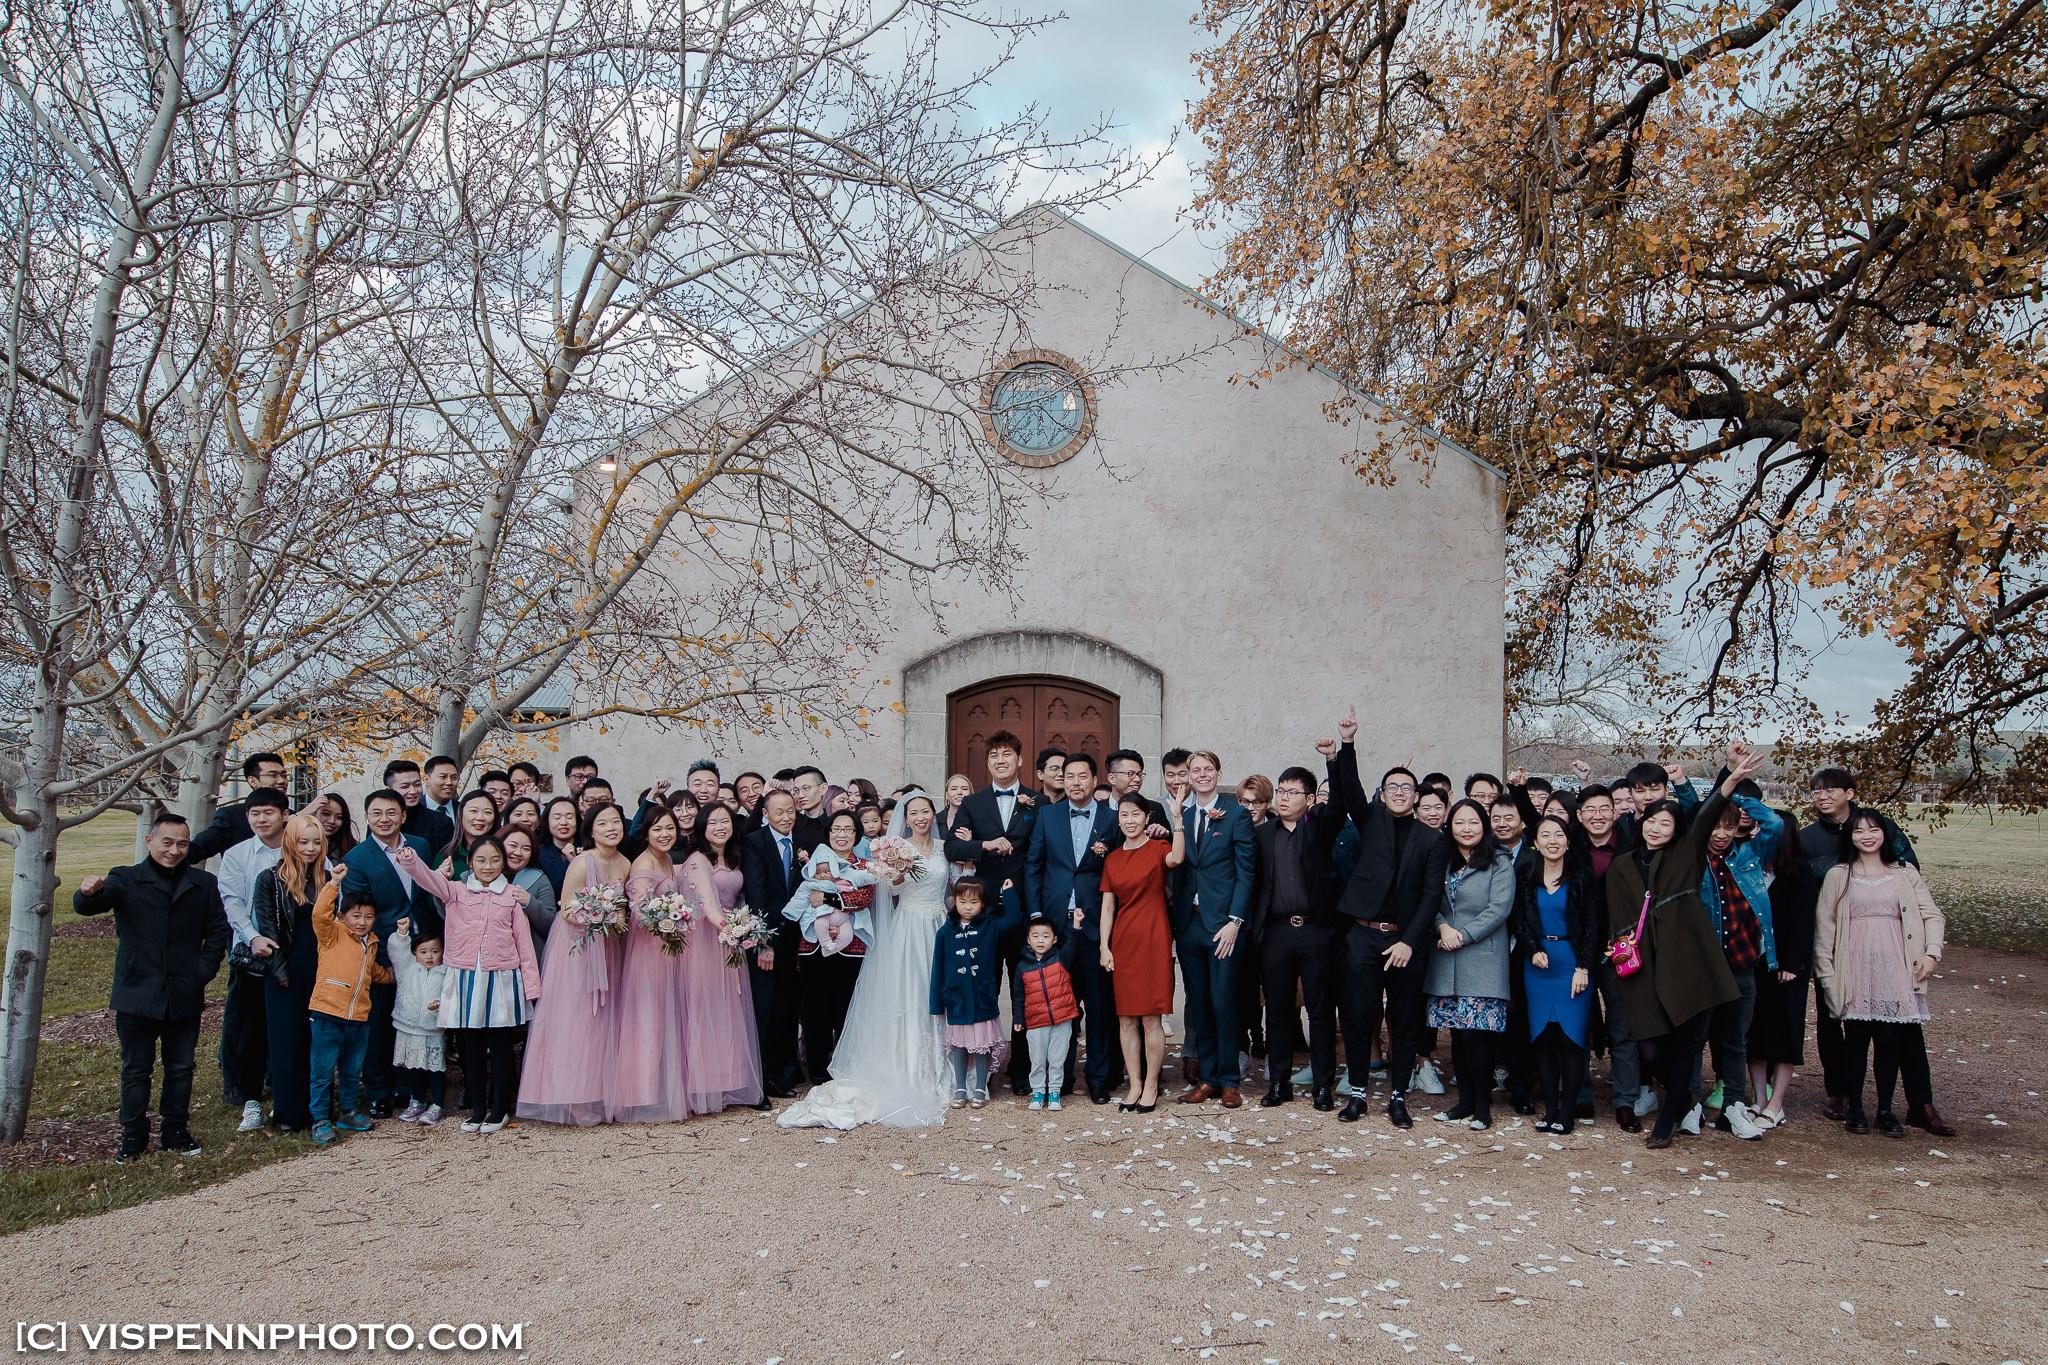 WEDDING DAY Photography Melbourne CoreyCoco 2P 06375 5D4 ZHPENN